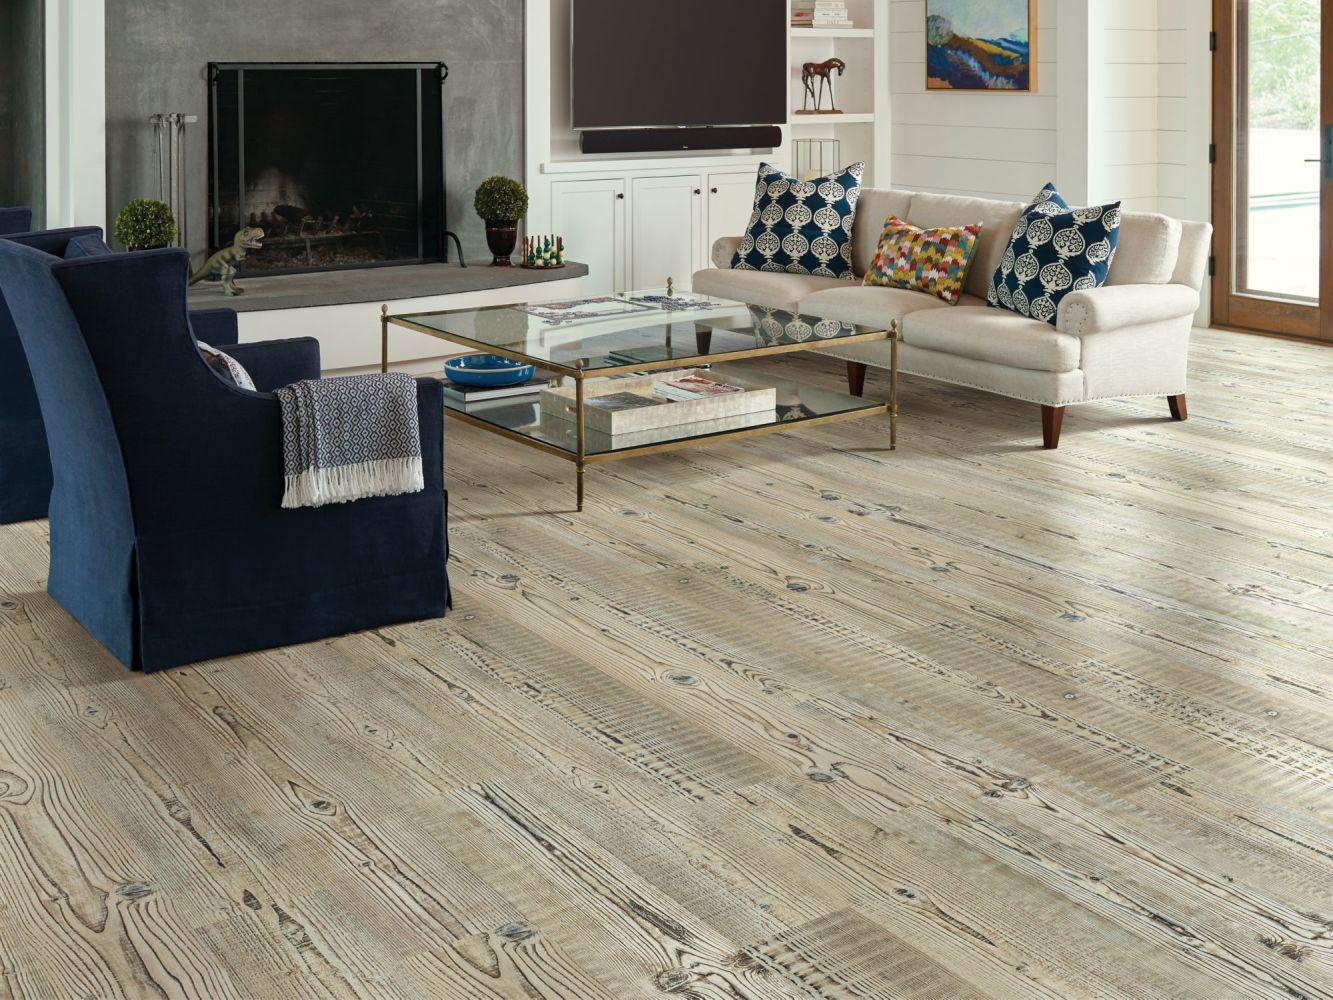 Shaw Floors Travera Plus 20 Accent Pine 07063_FR622